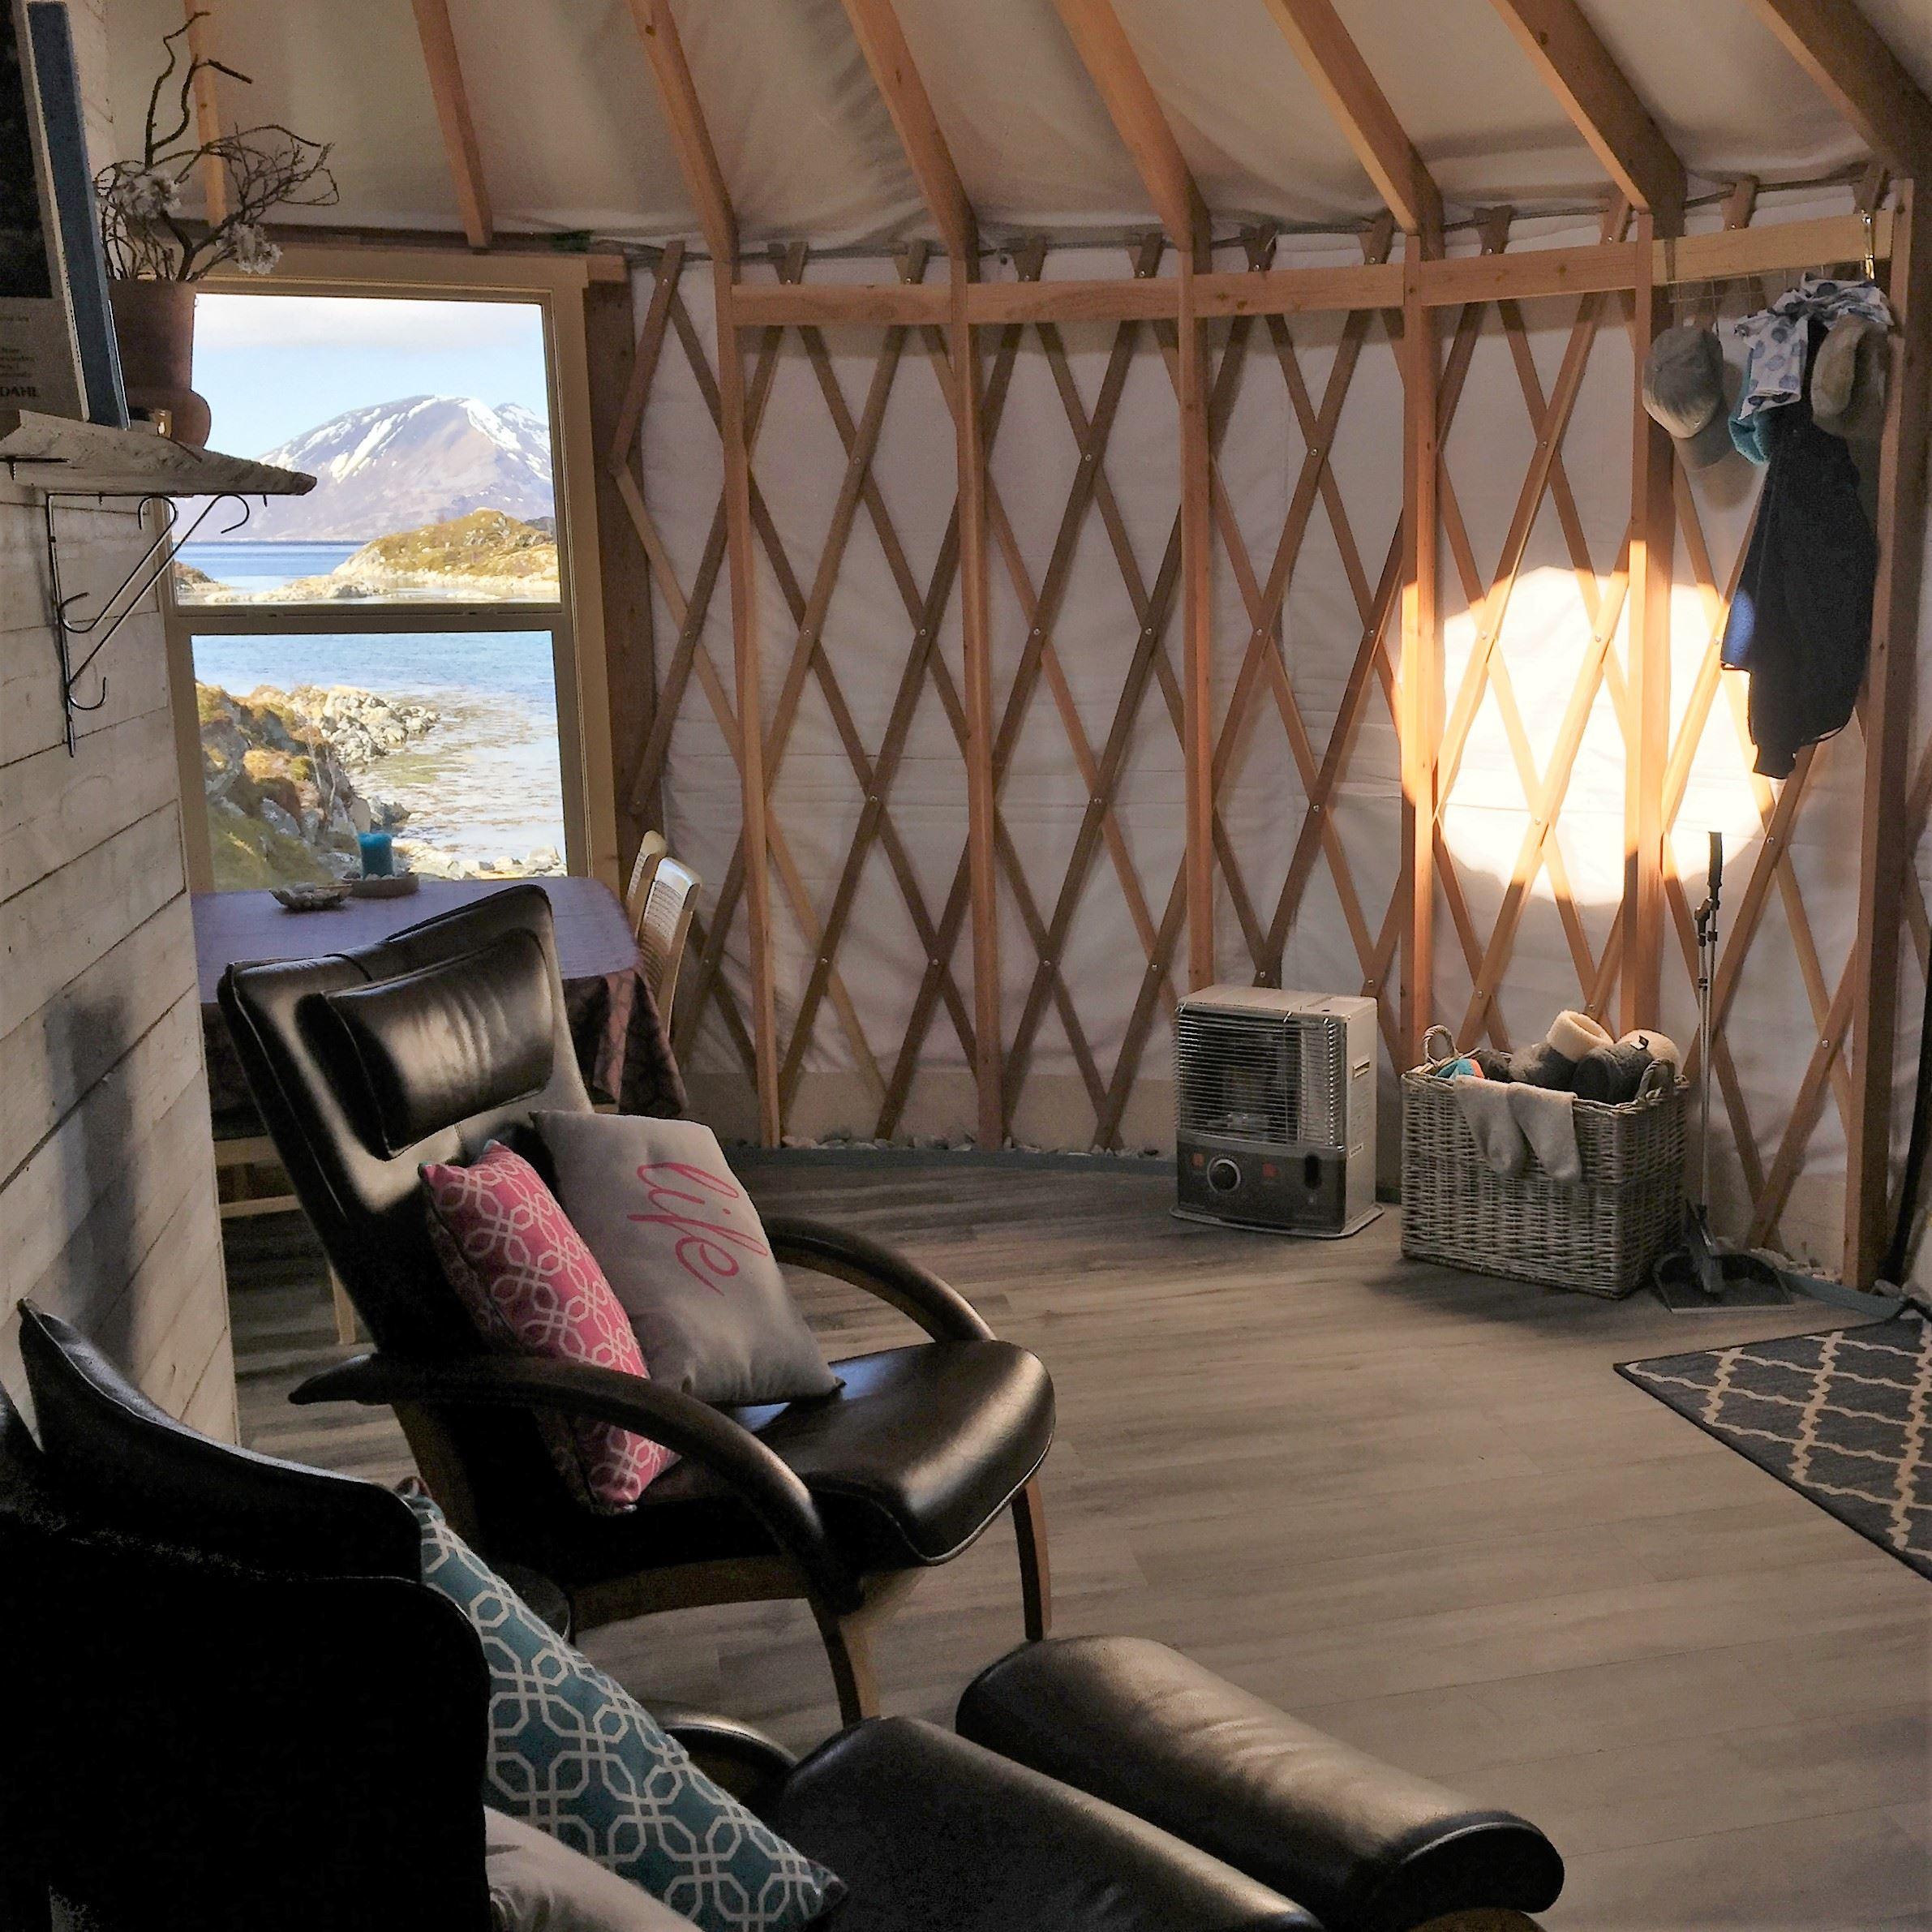 2 Dager Arctic Camp med kajakk - Elements Arctic Camp